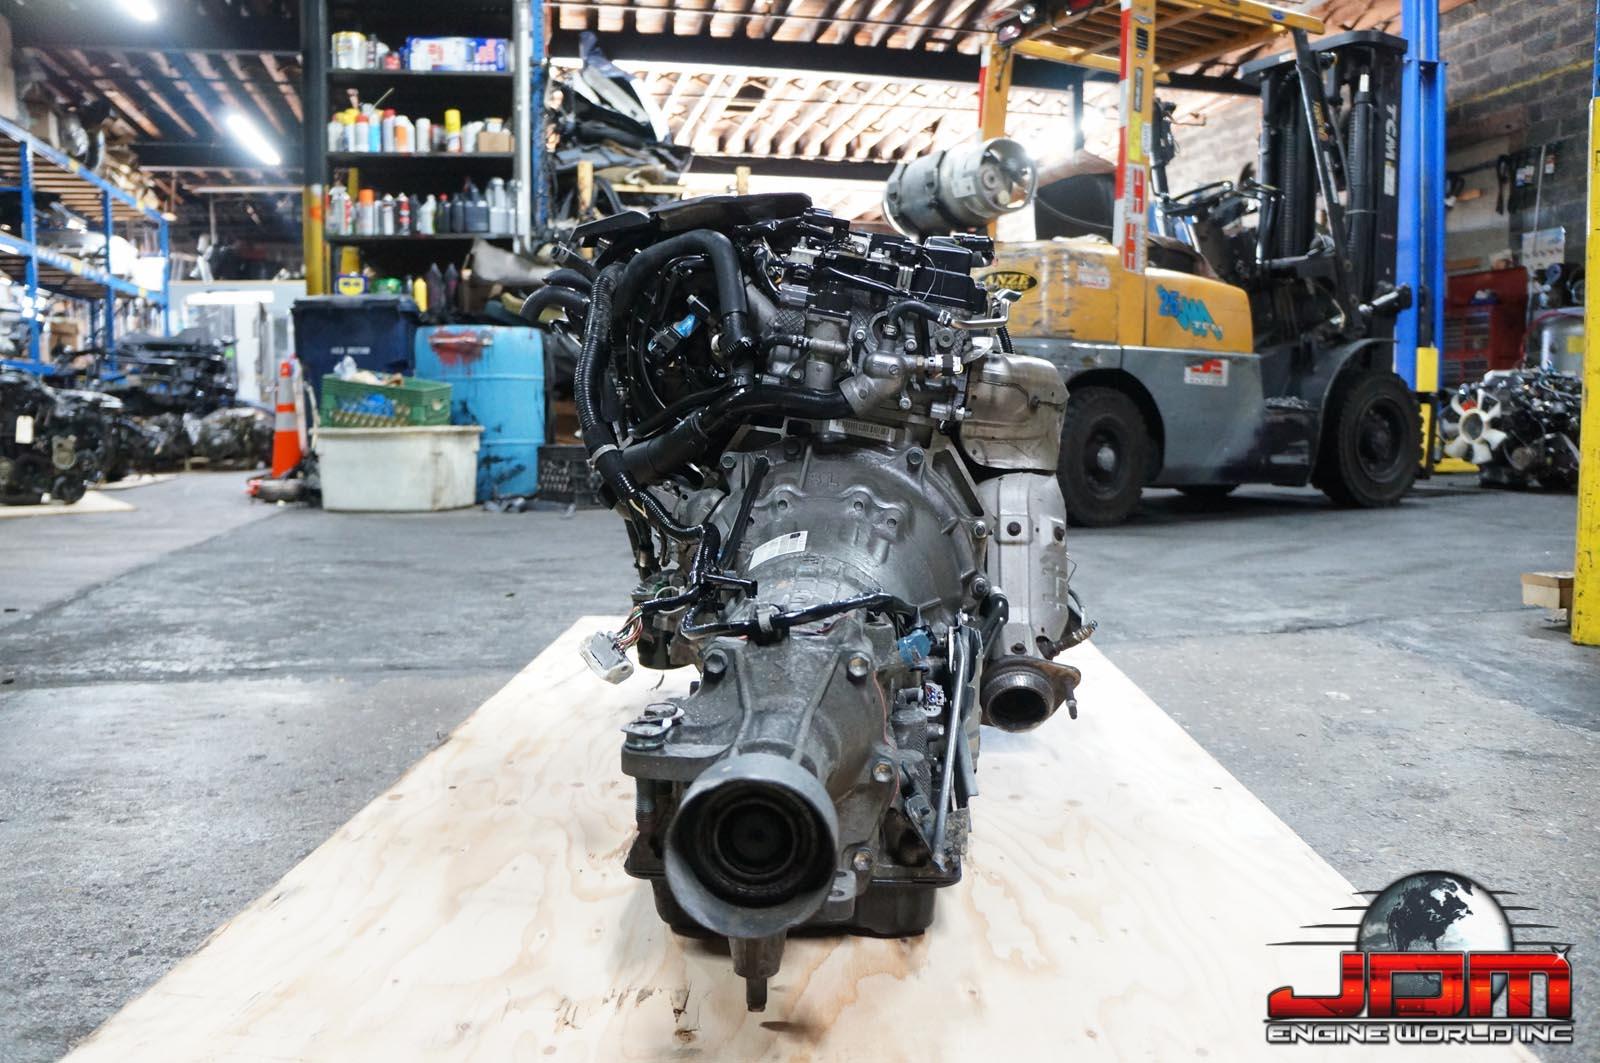 06-12 MAZDA MIATA LF ENGINE & AUTOMATIC TRANSMISSION 2.0L DOHC 16V JDM LF-ZE